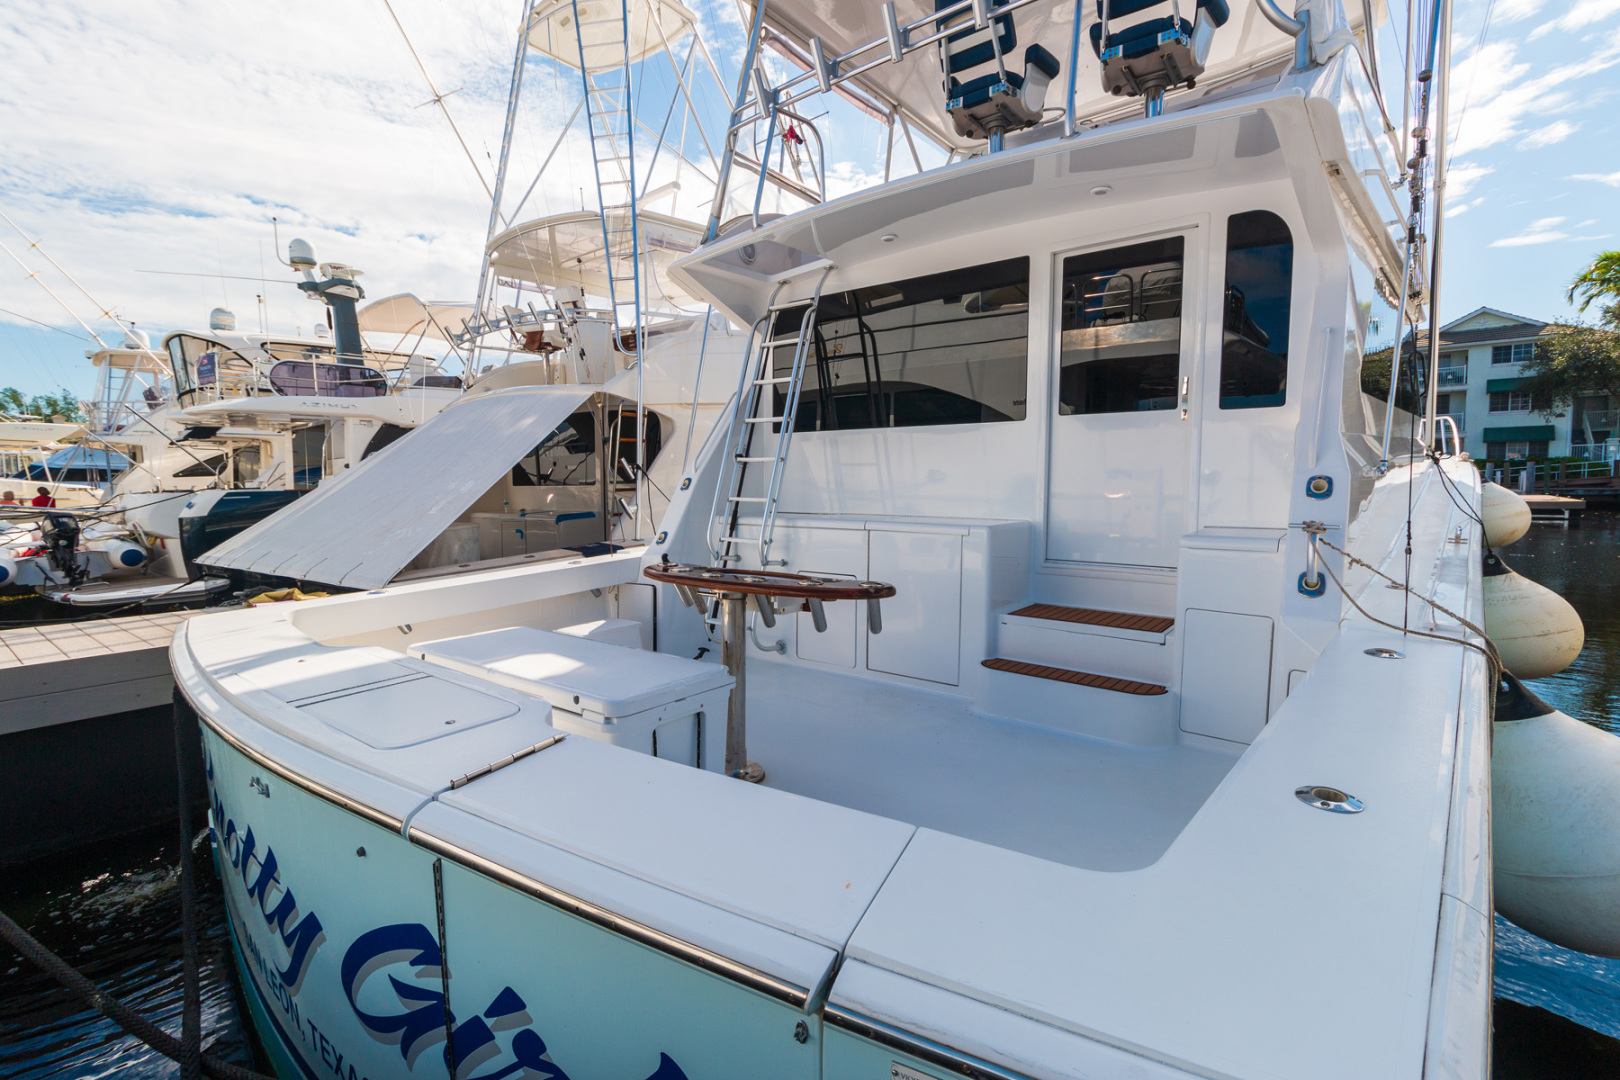 Viking-Convertible 2000-Knotty Girl Fort Lauderdale-Florida-United States-1564769   Thumbnail